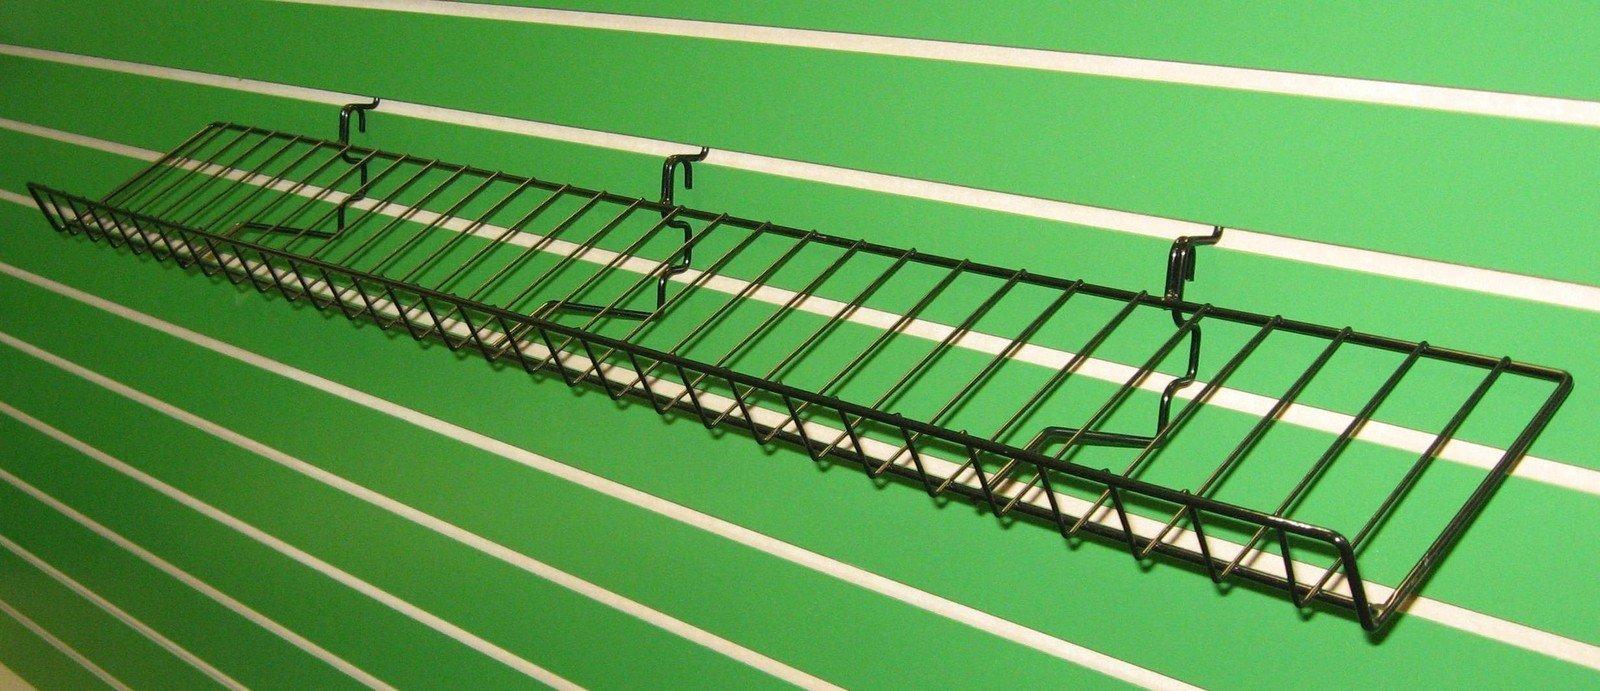 8''D X 46''L Candy Shelf Shelves Rack Slatwall Grid Pegboard Display BLACK Lot of 5 NEW